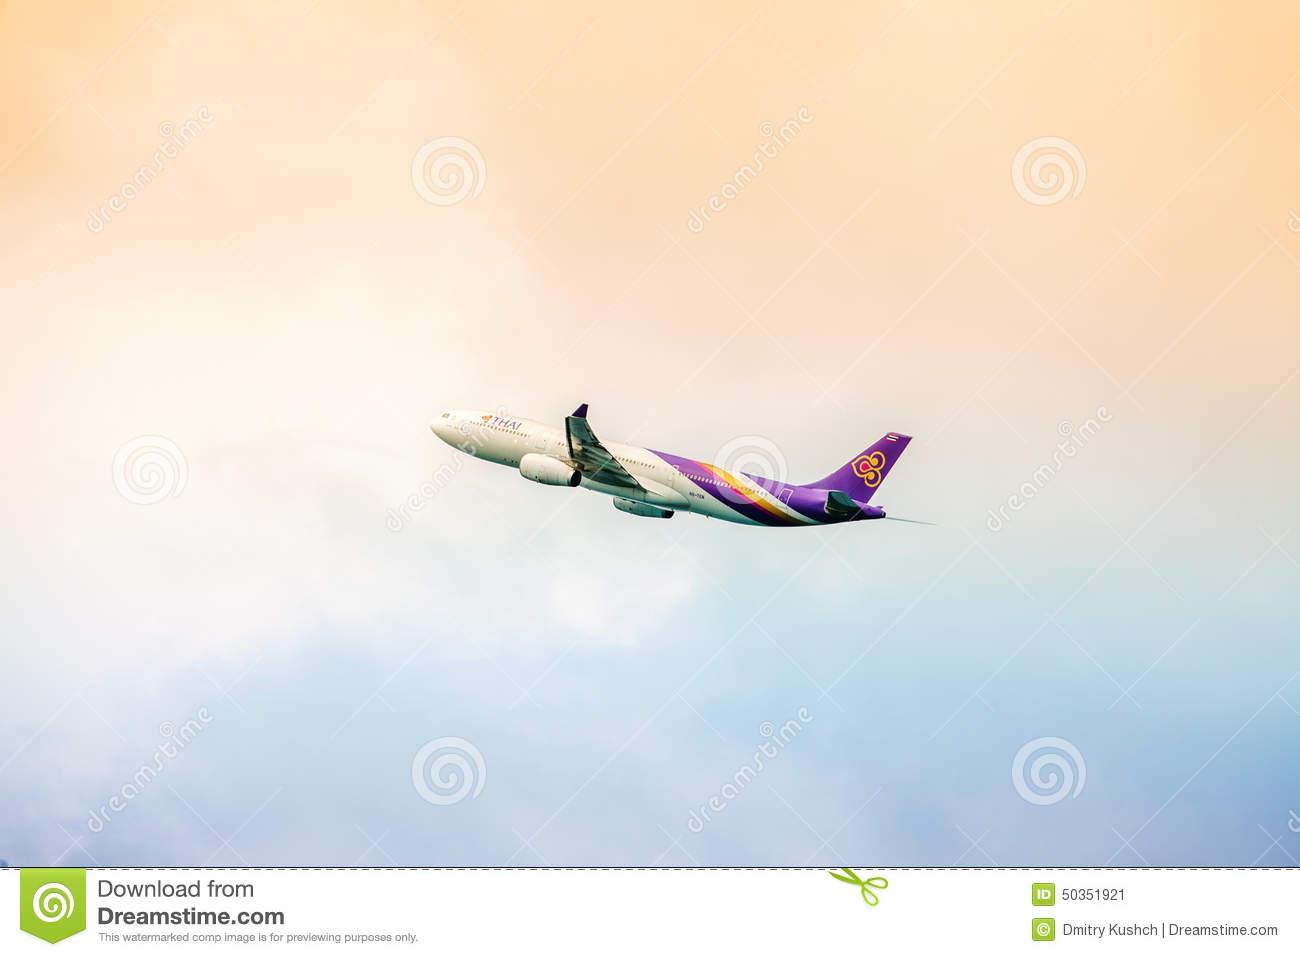 Best 40 Airway Background on HipWallpaper Thomas Kinkade 1300x957